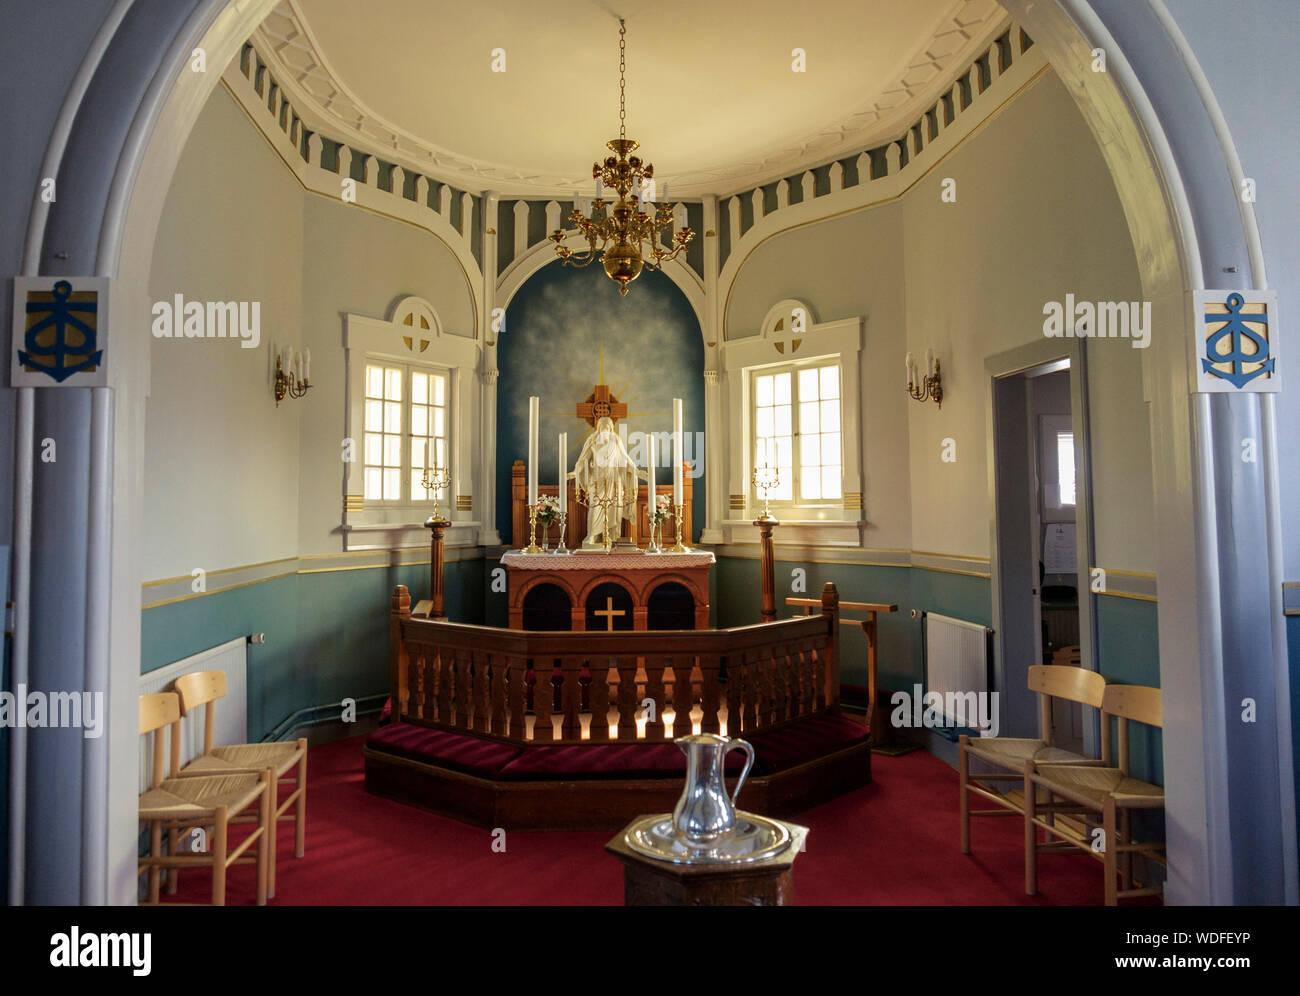 Altar inside the wooden church built in Norwegian style 1909. Paamiut (Frederikshåb), Sermersooq, Greenland Stock Photo